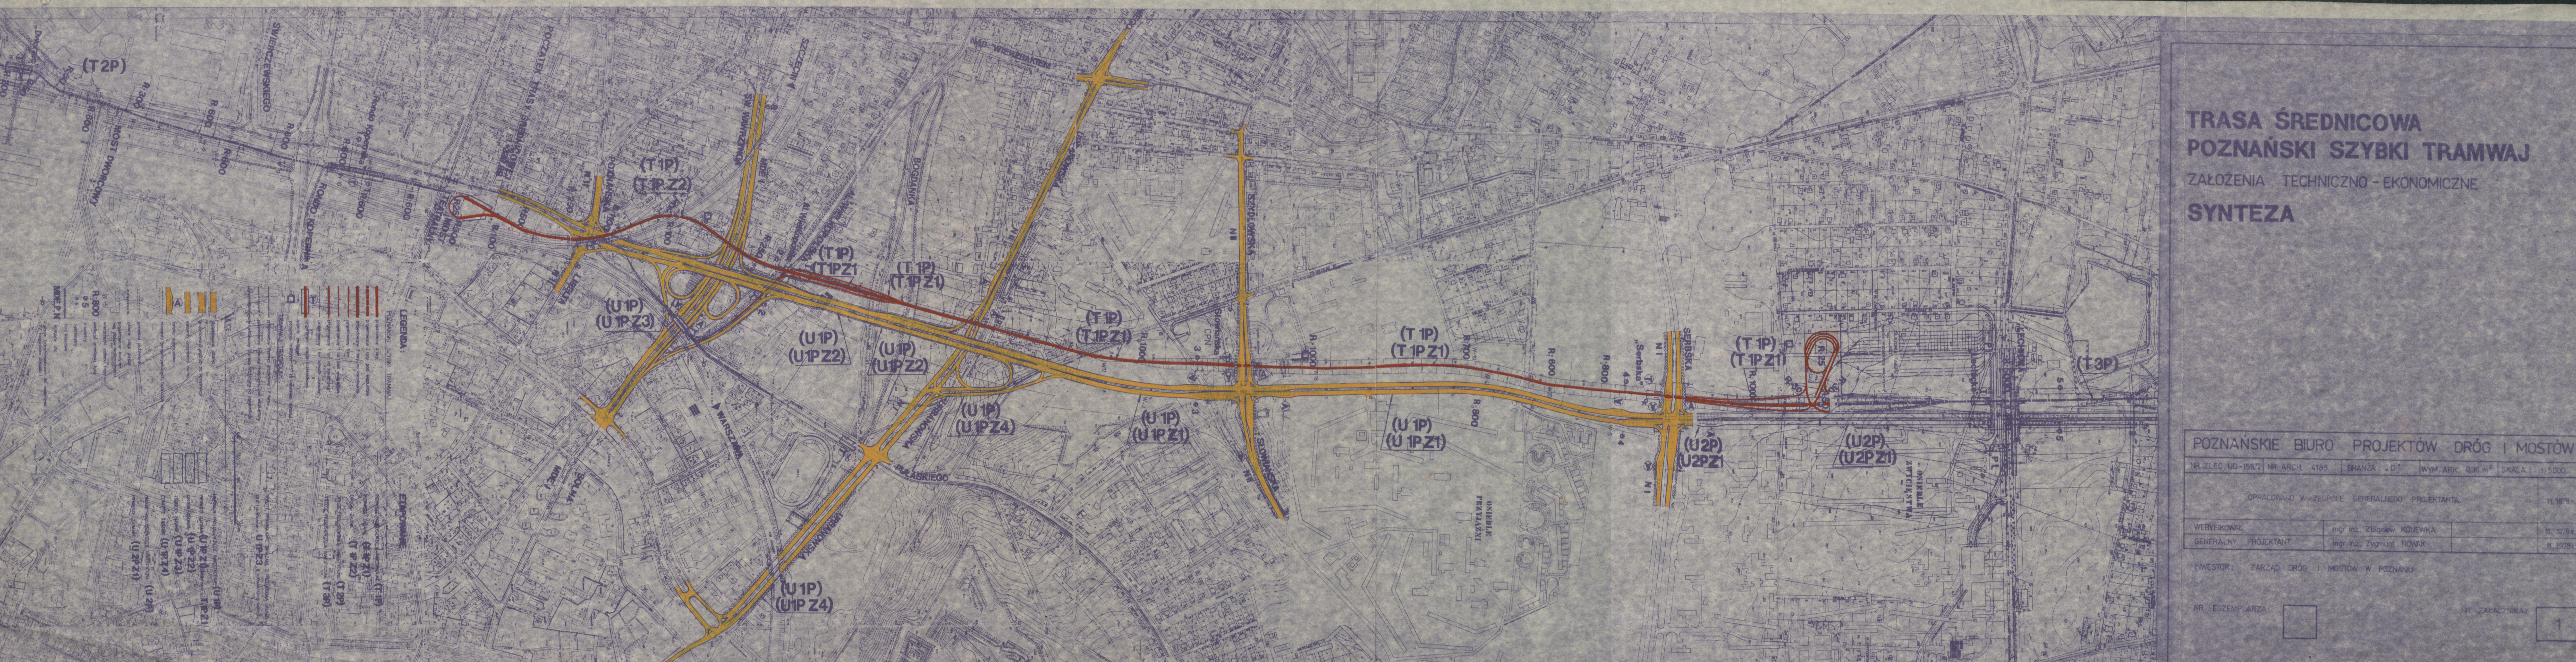 Poznań projekt PST 1978